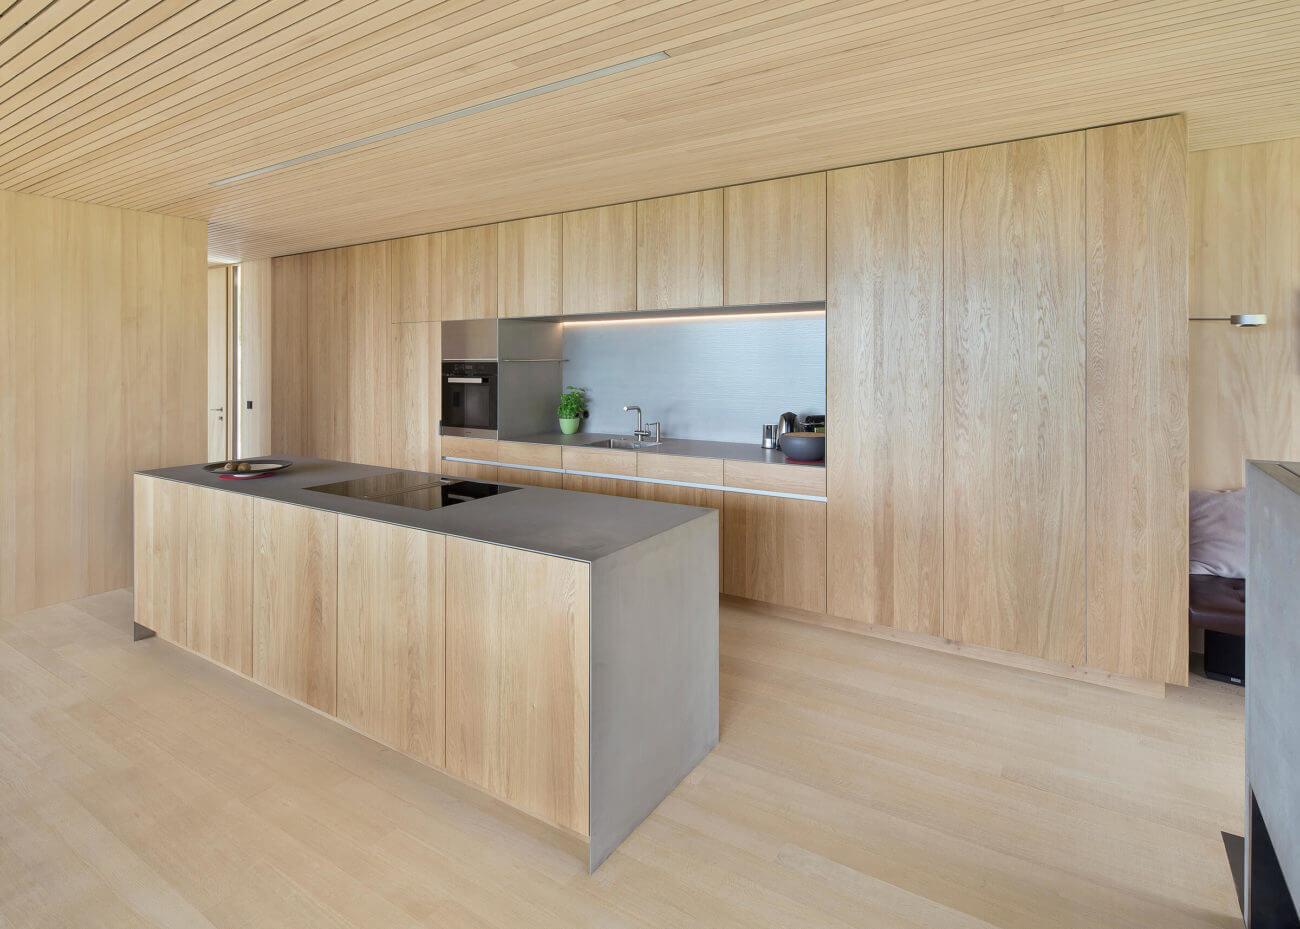 Holz Kuche Mit Kochinsel Spritzschutz Kuche Insel